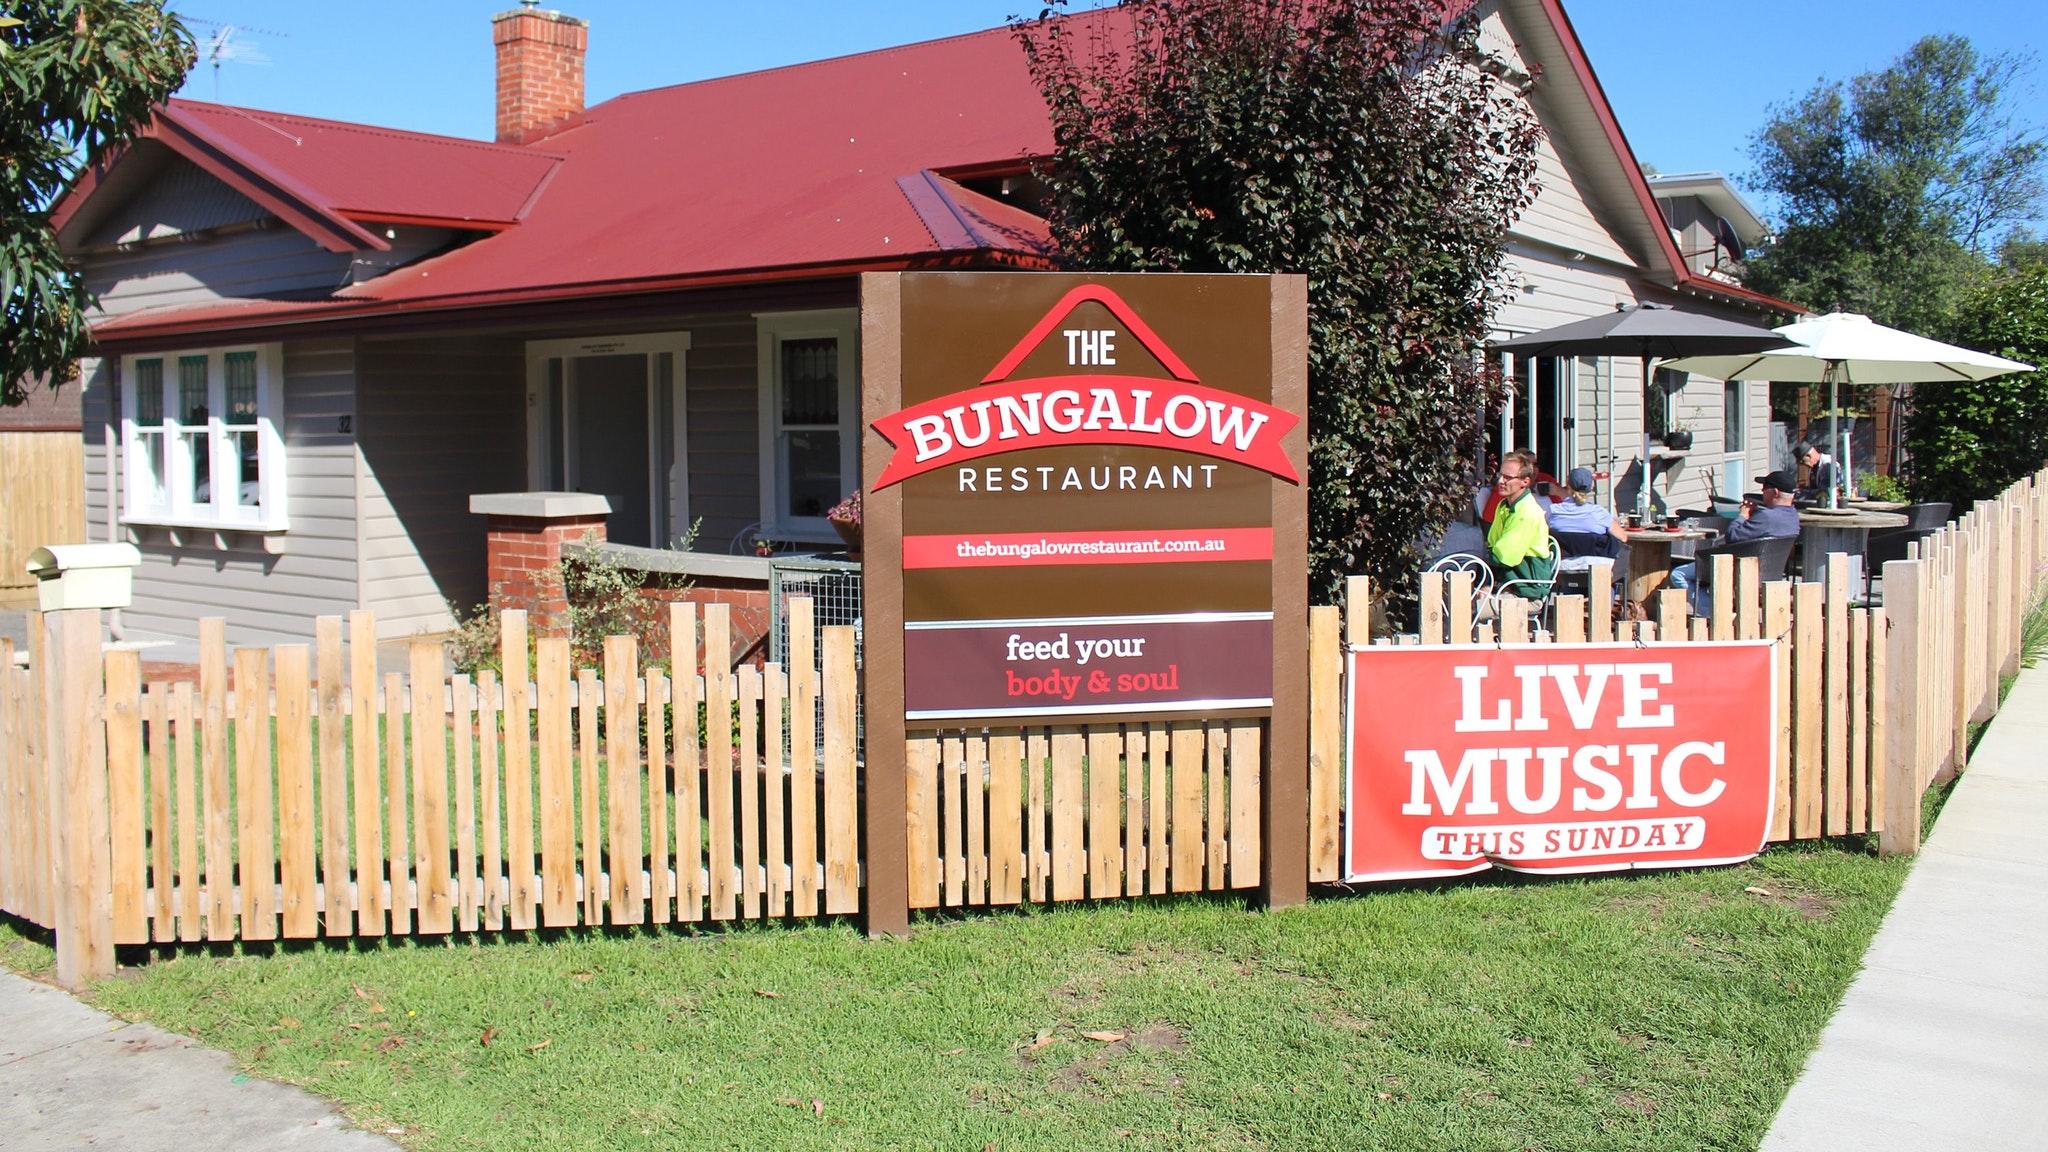 The Bungalow Restaurant